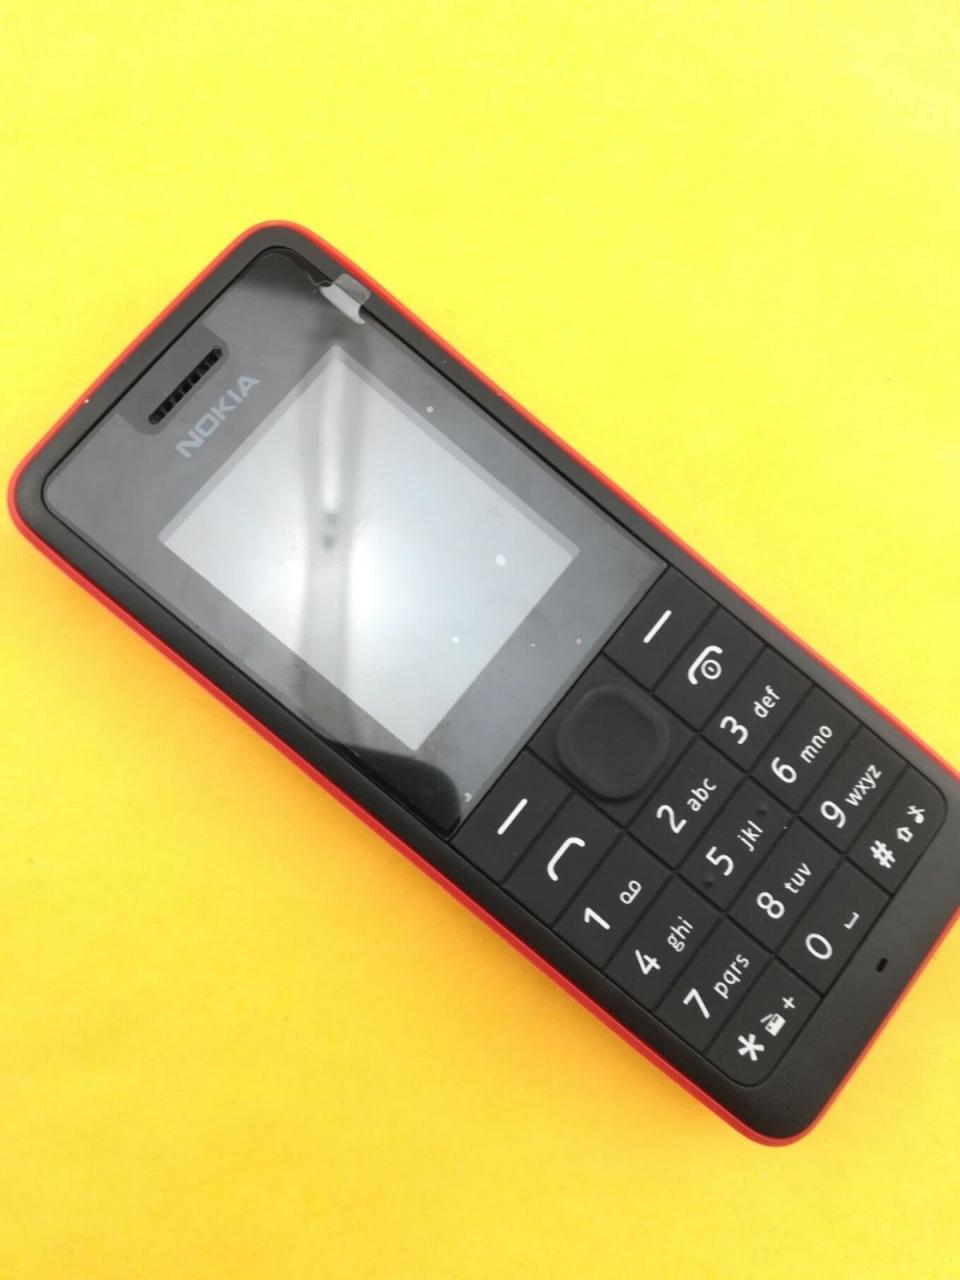 new Nokia 106 Unlocked Simple Mobile Phone Multiple keyboards languages white 7